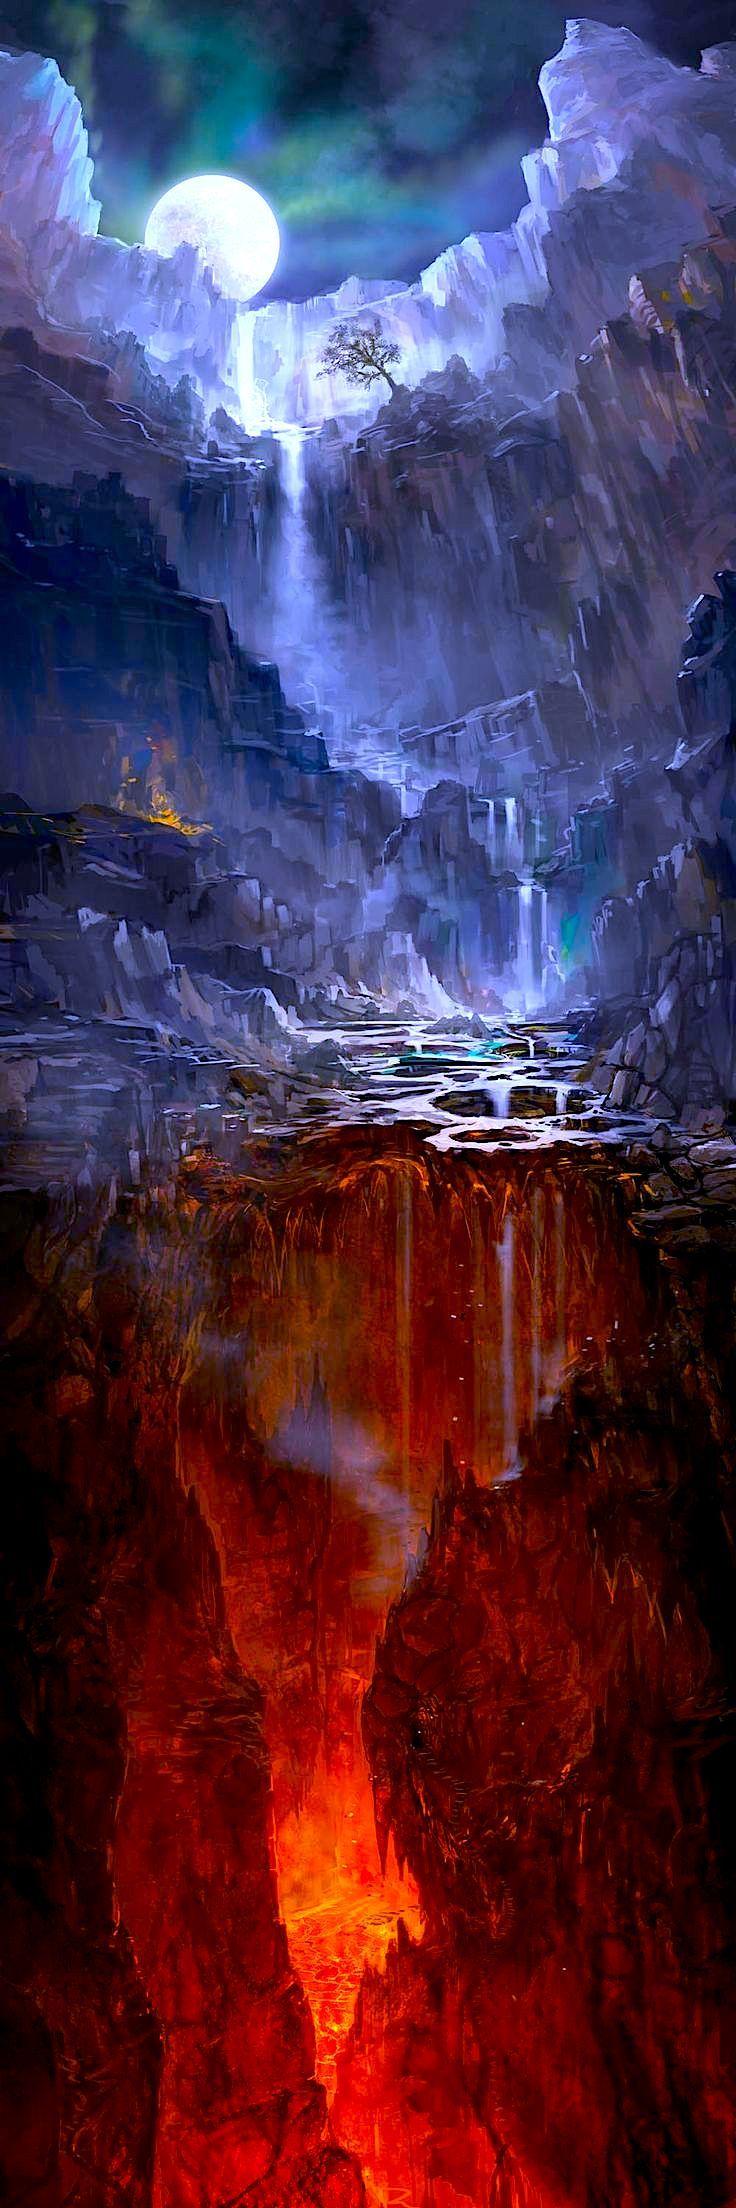 best foto images on pinterest concept art fantasy landscape